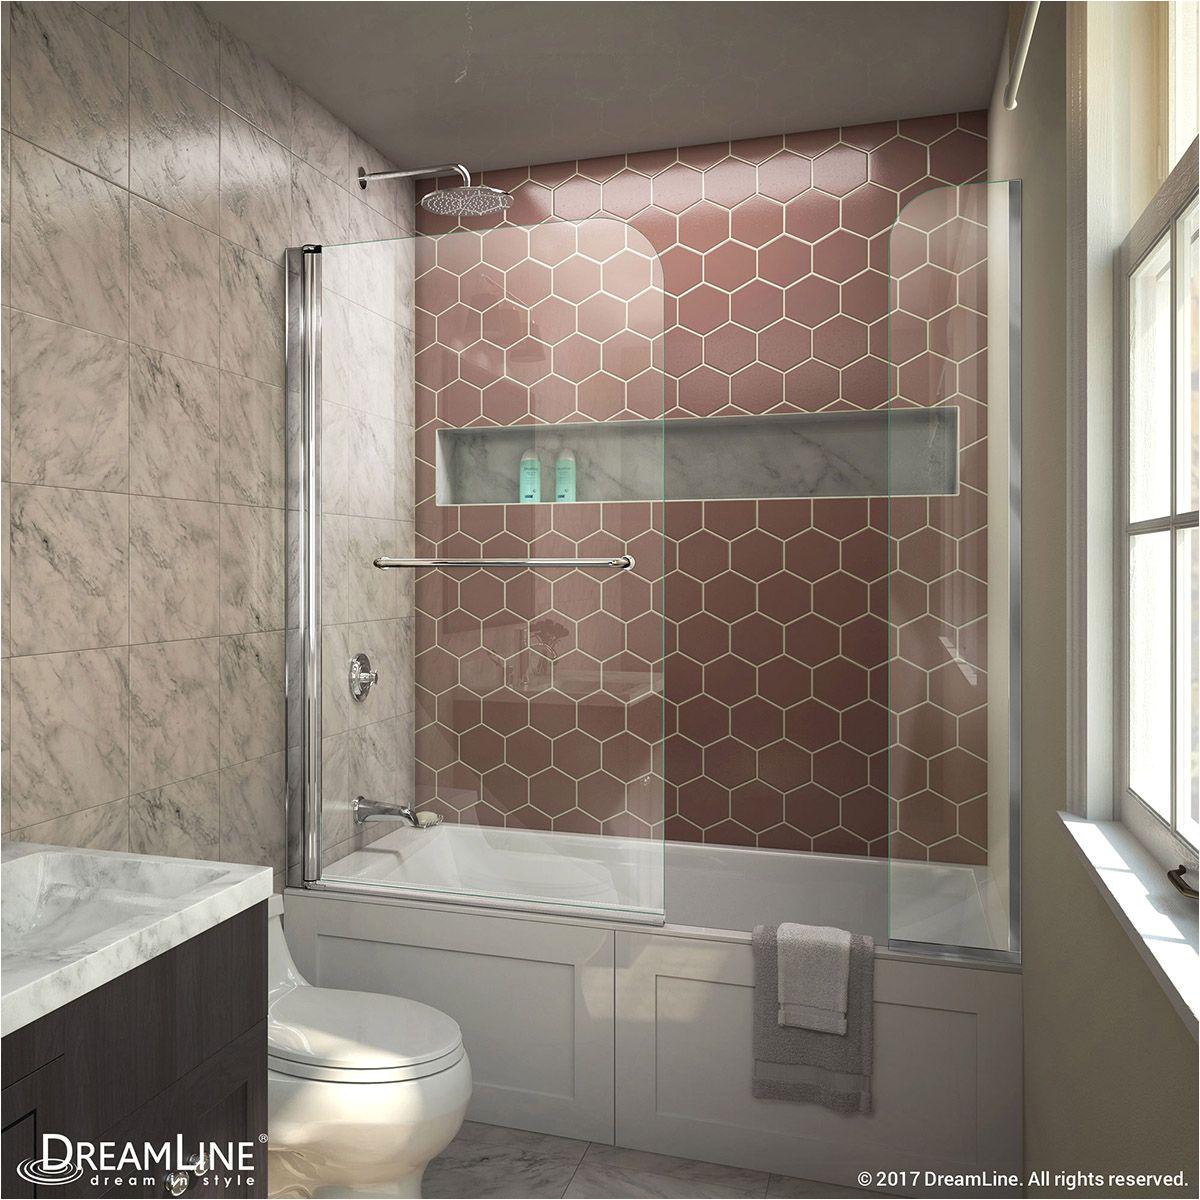 aqua swing 56 60 w x 58 h frameless tub door with extender panel